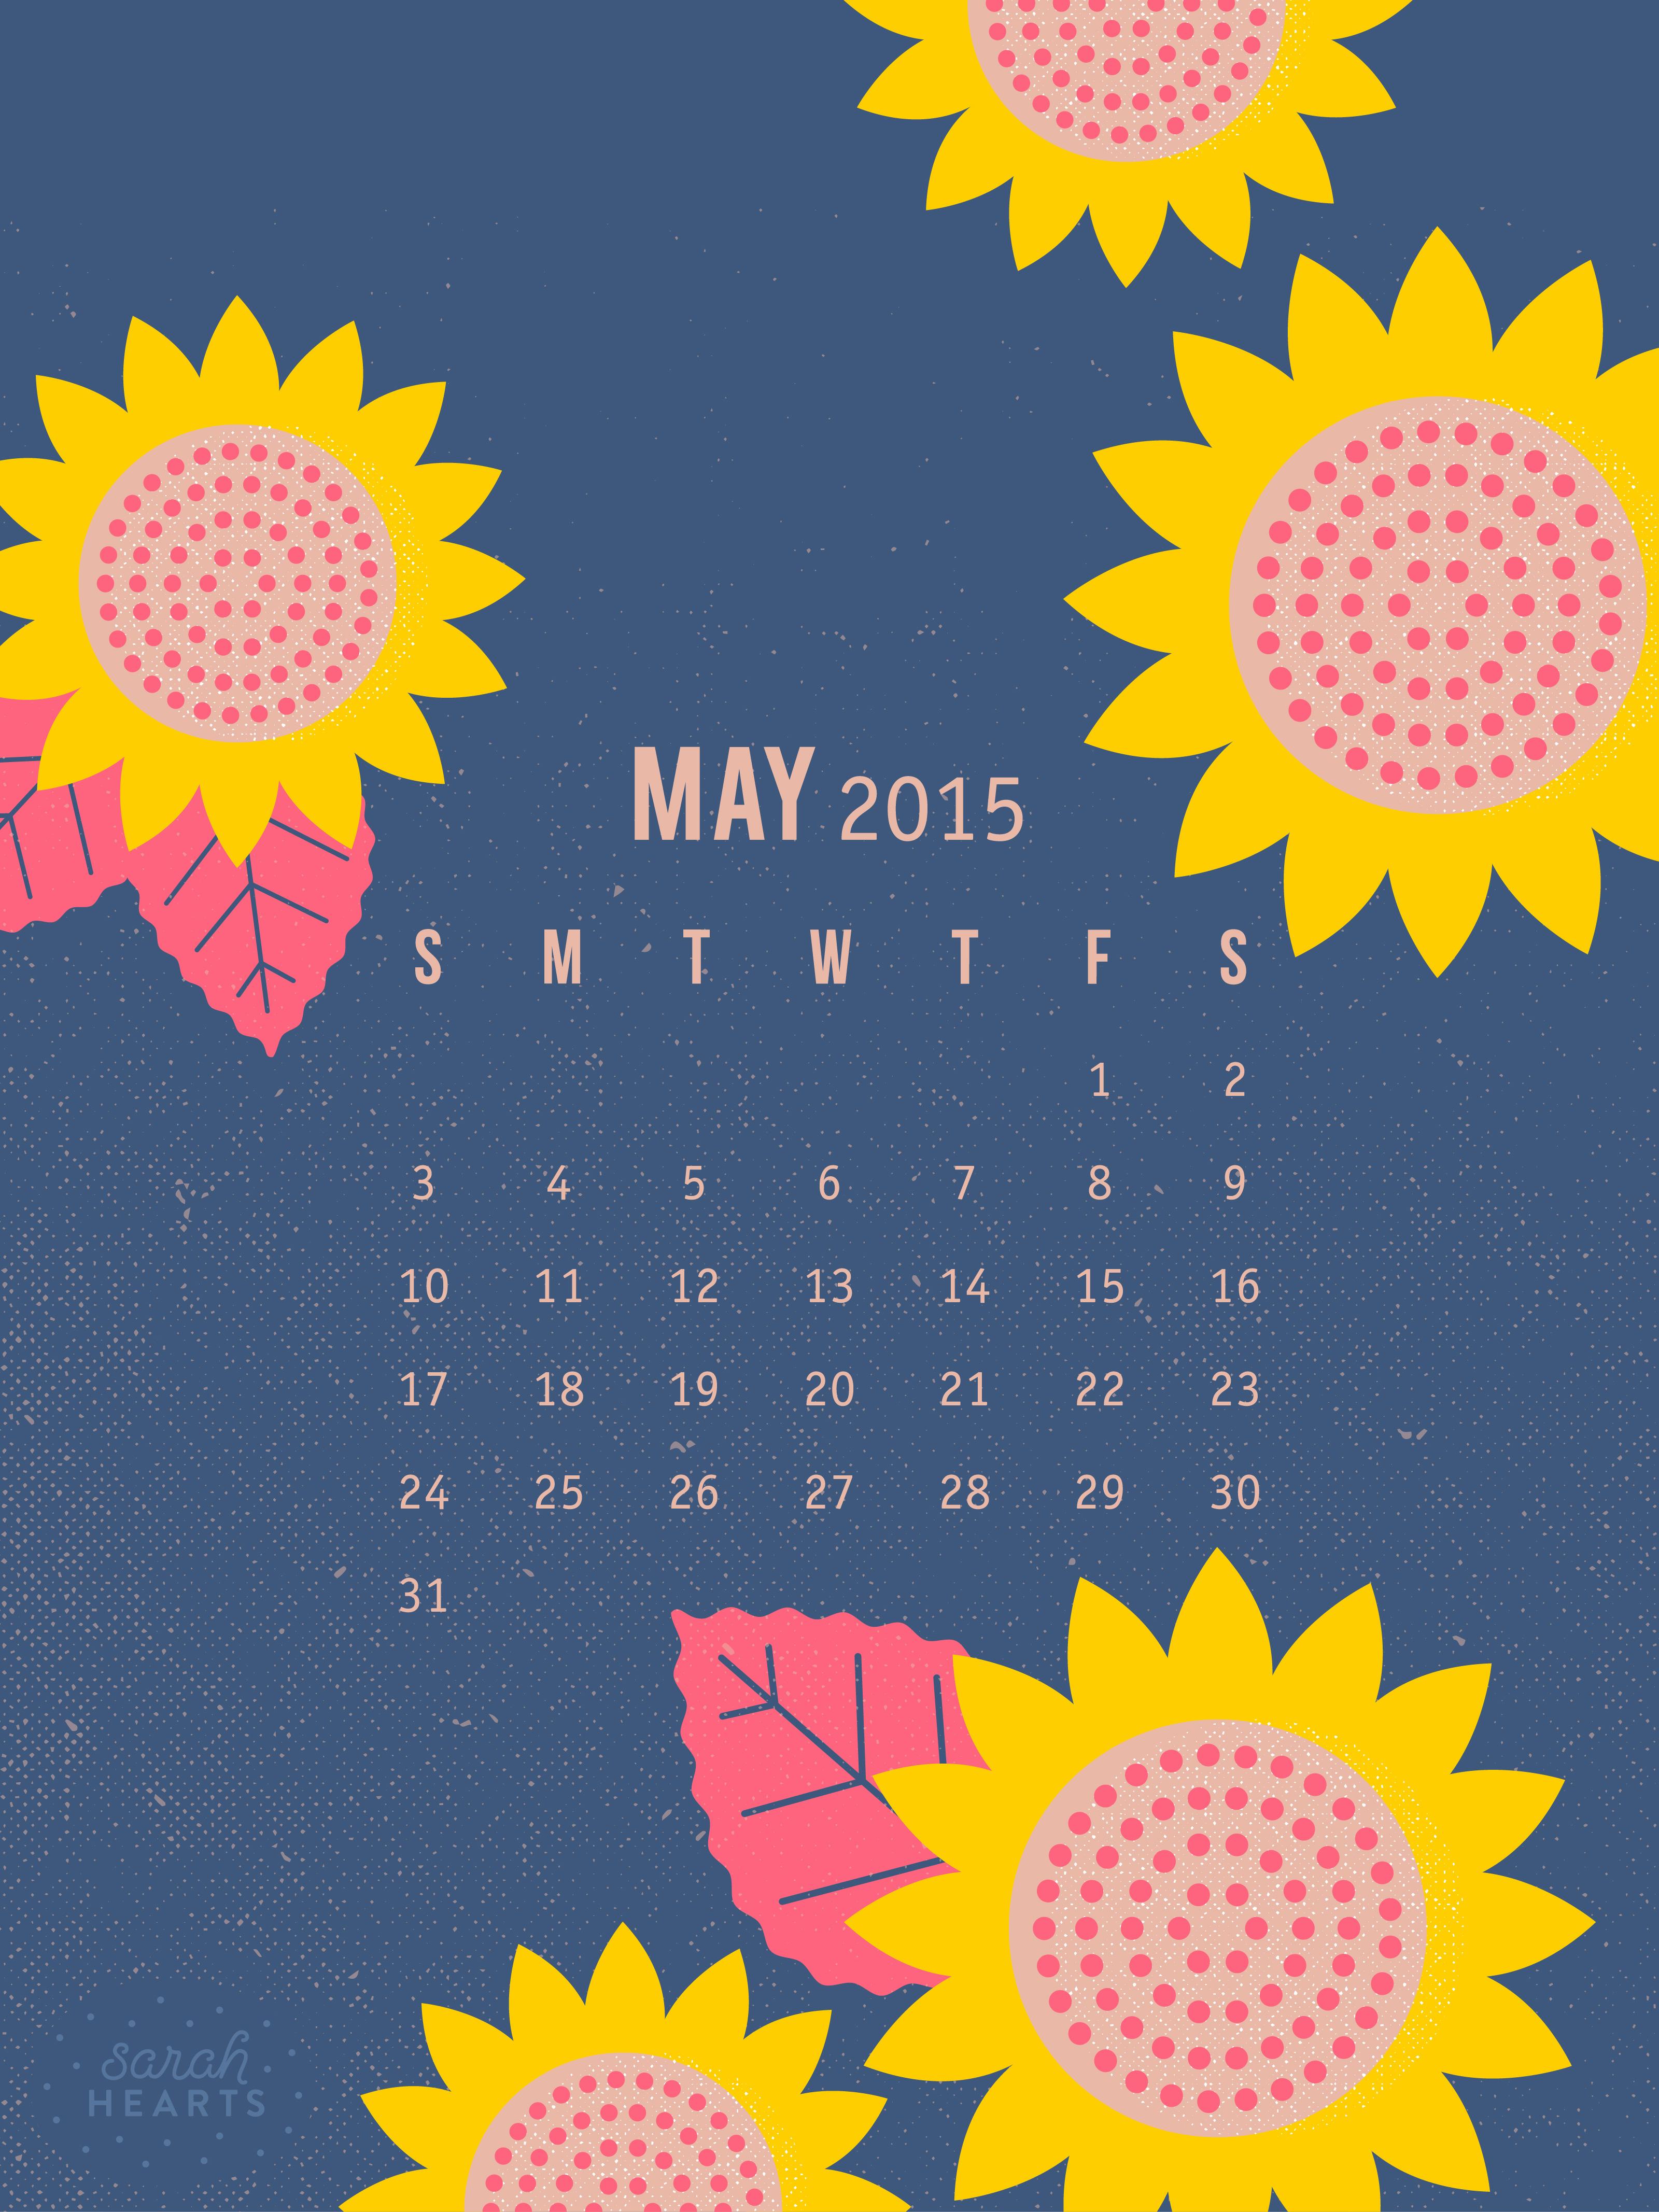 Quote Wallpaper Computer May 2015 Calendar Wallpaper Sarah Hearts